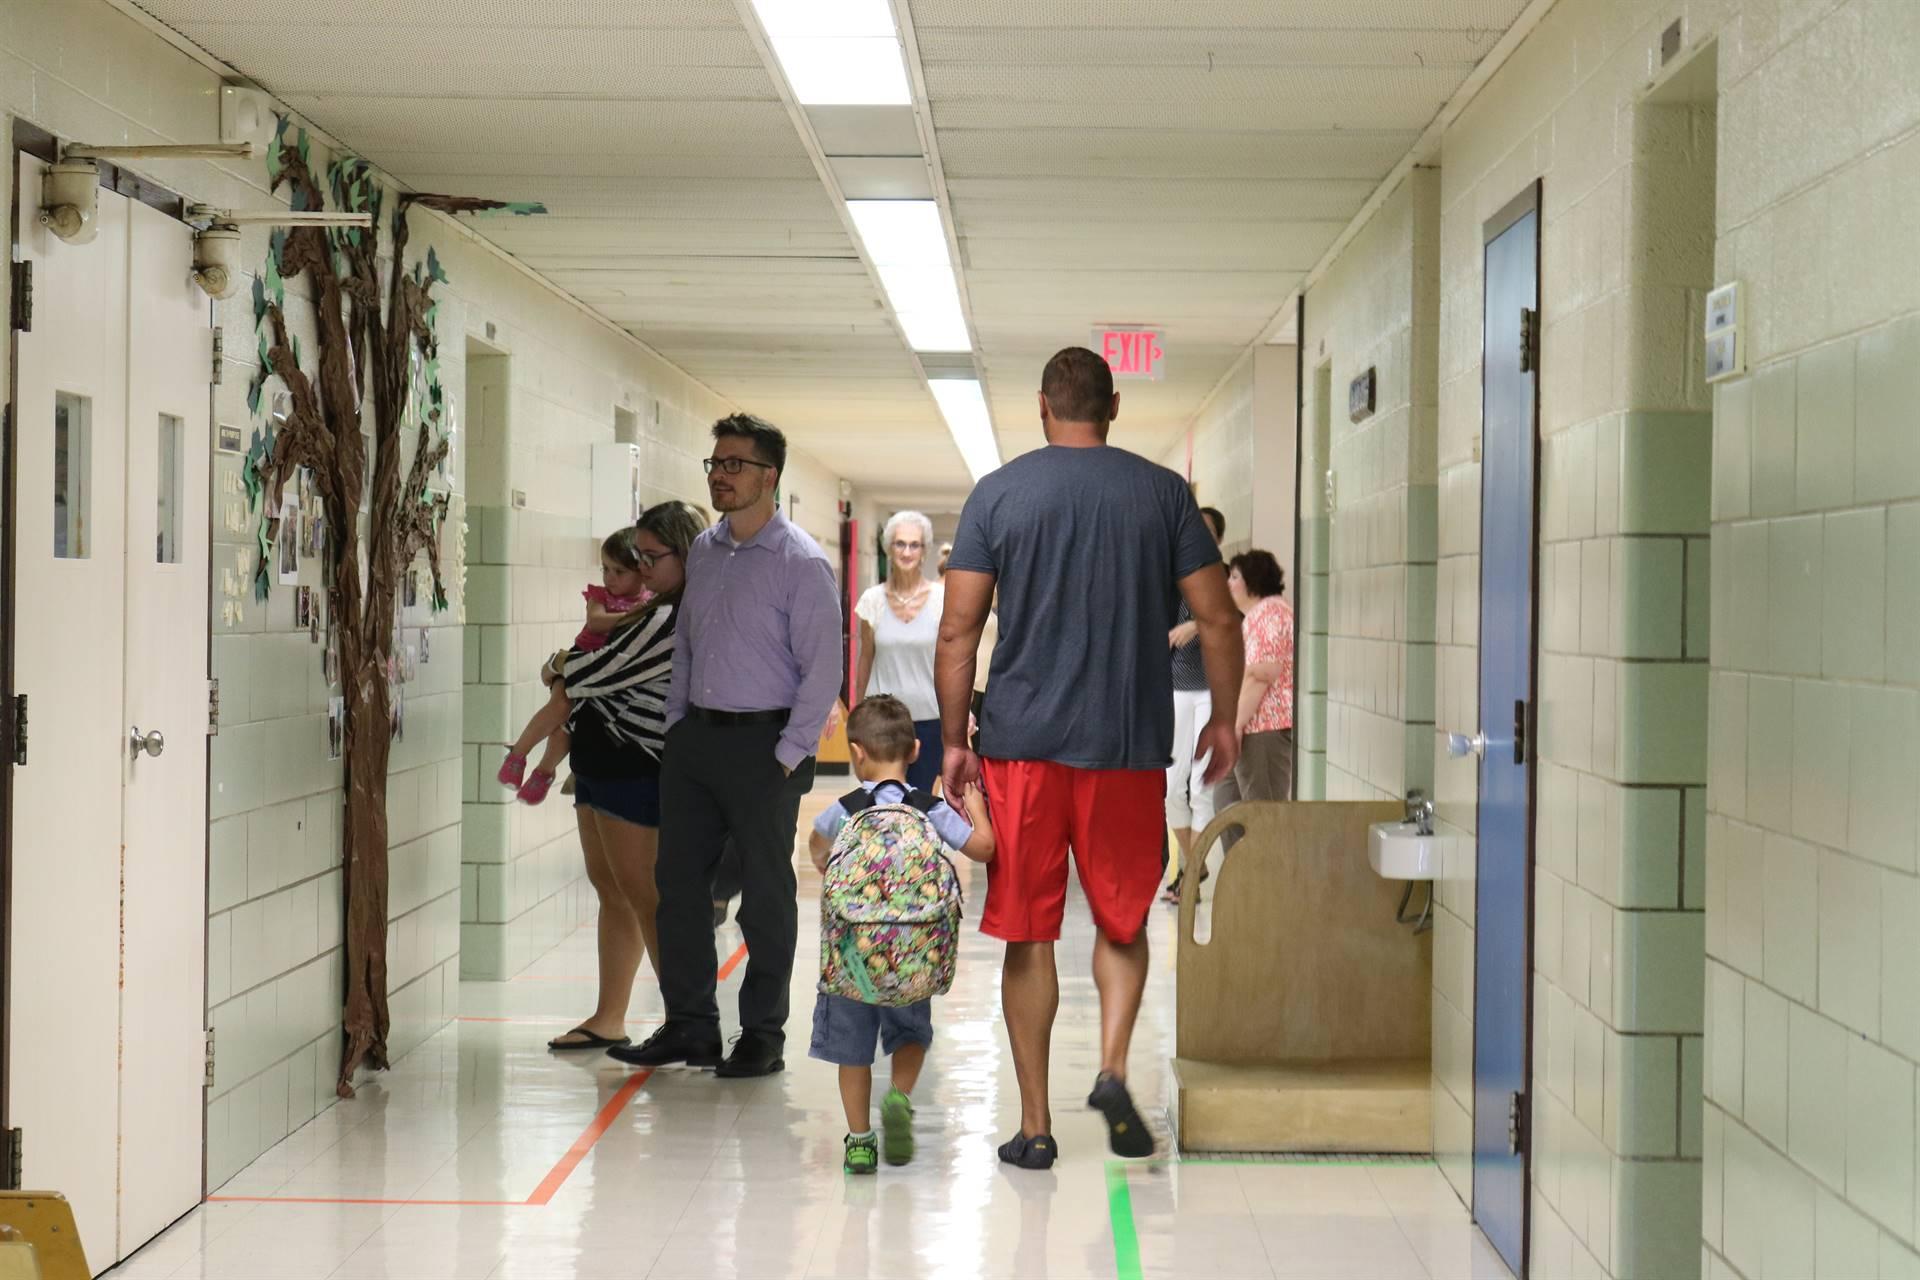 2 males, 1 female walking boy in hall